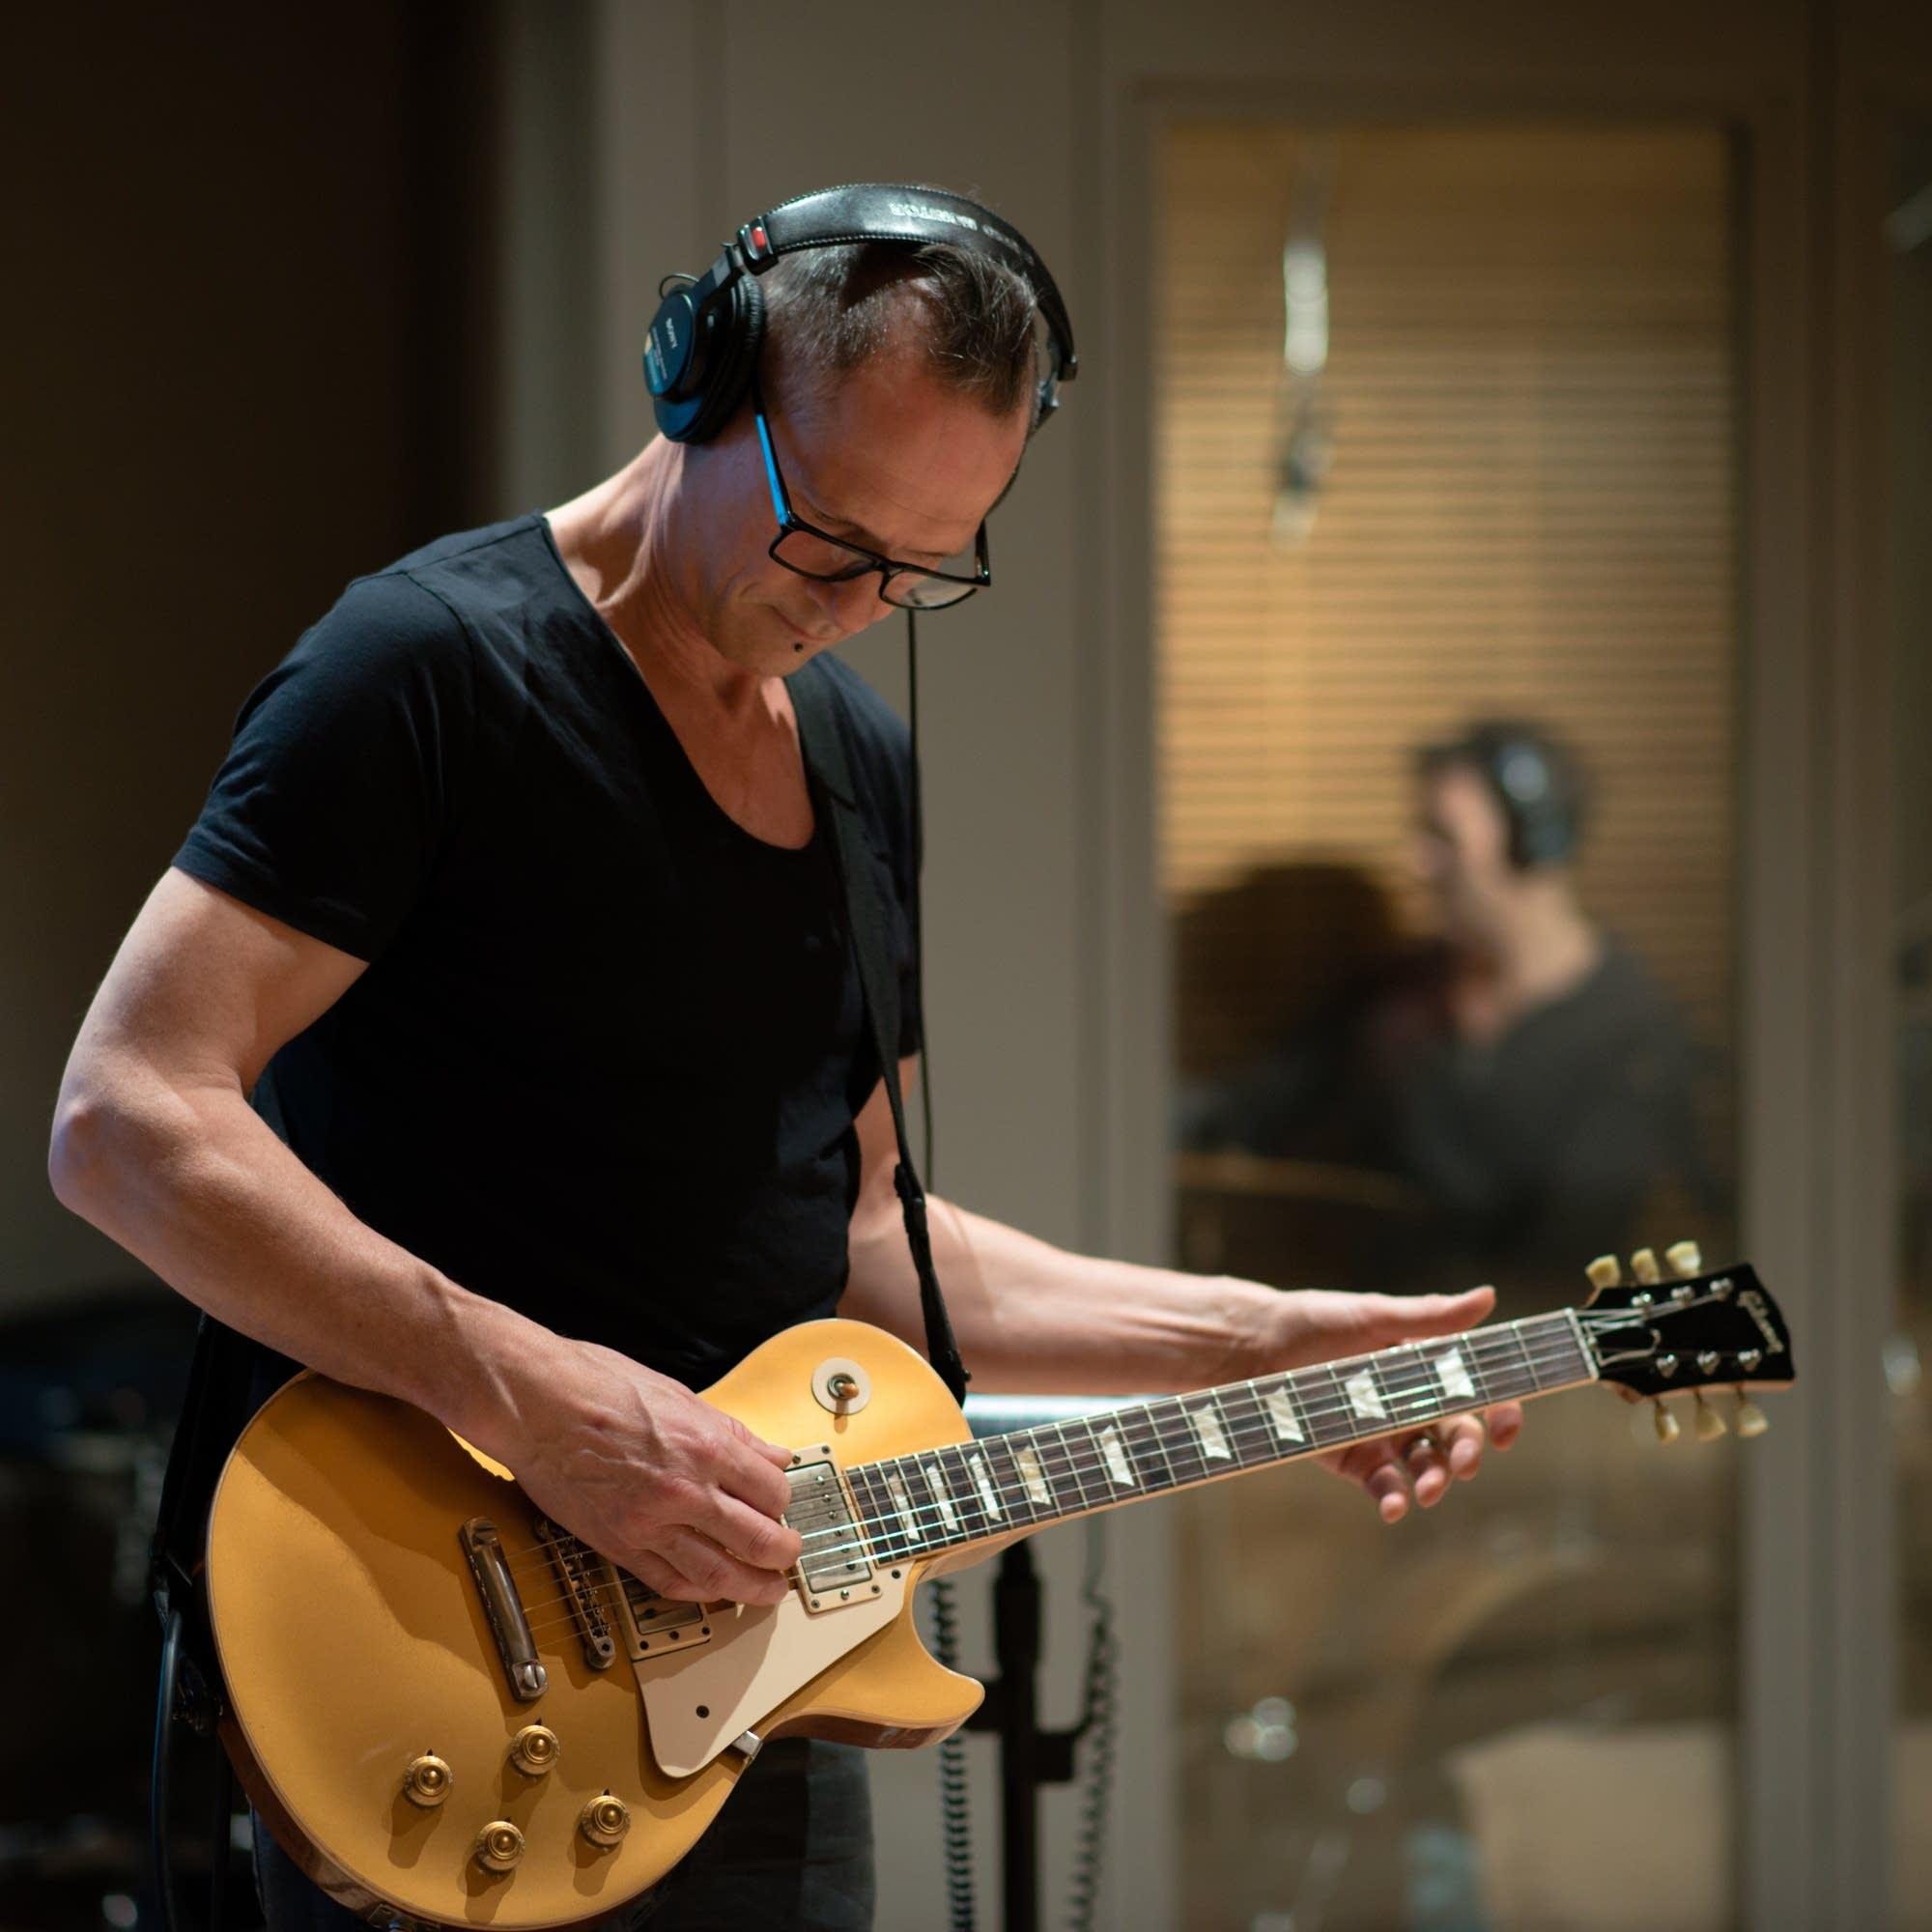 gary numan guitarist steve harris